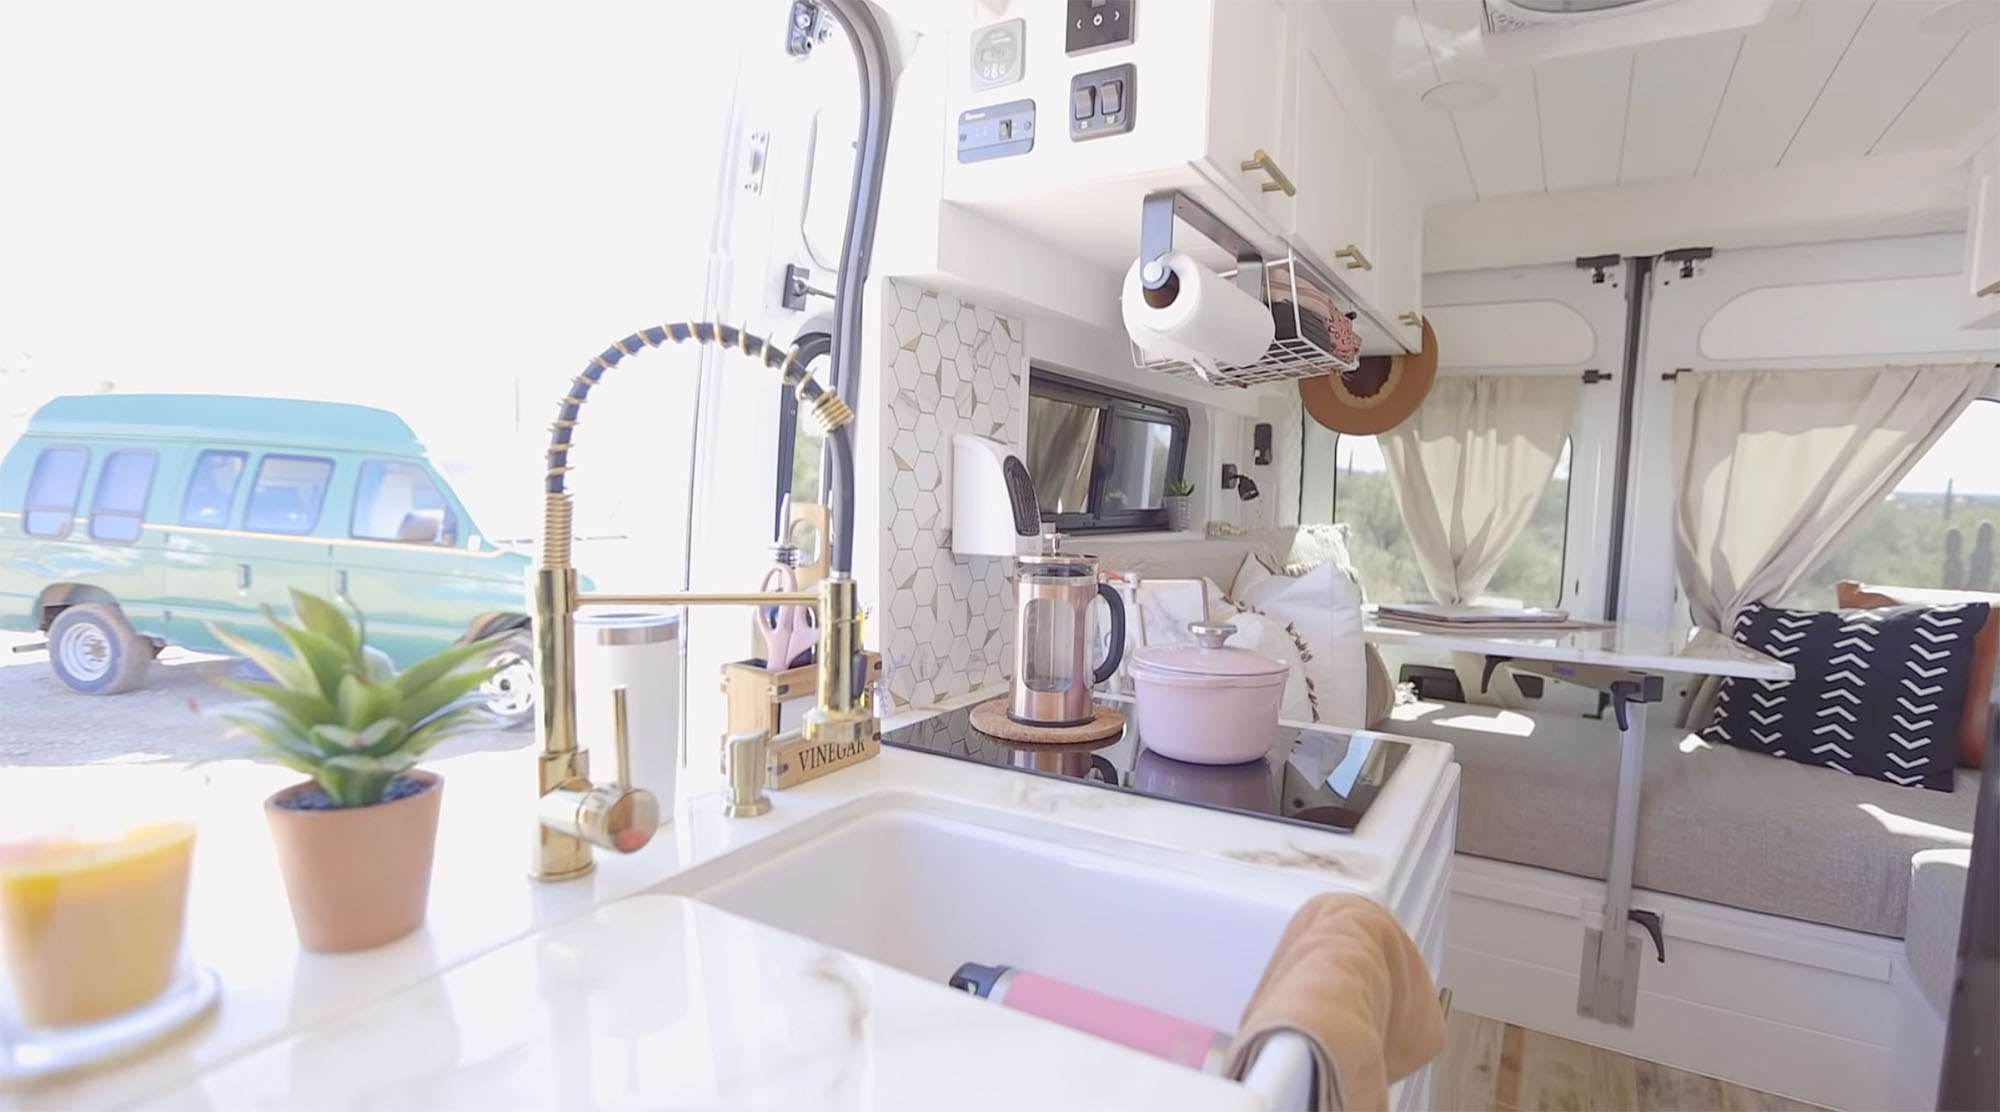 Zion van conversion Antoinette Yvonne kitchen